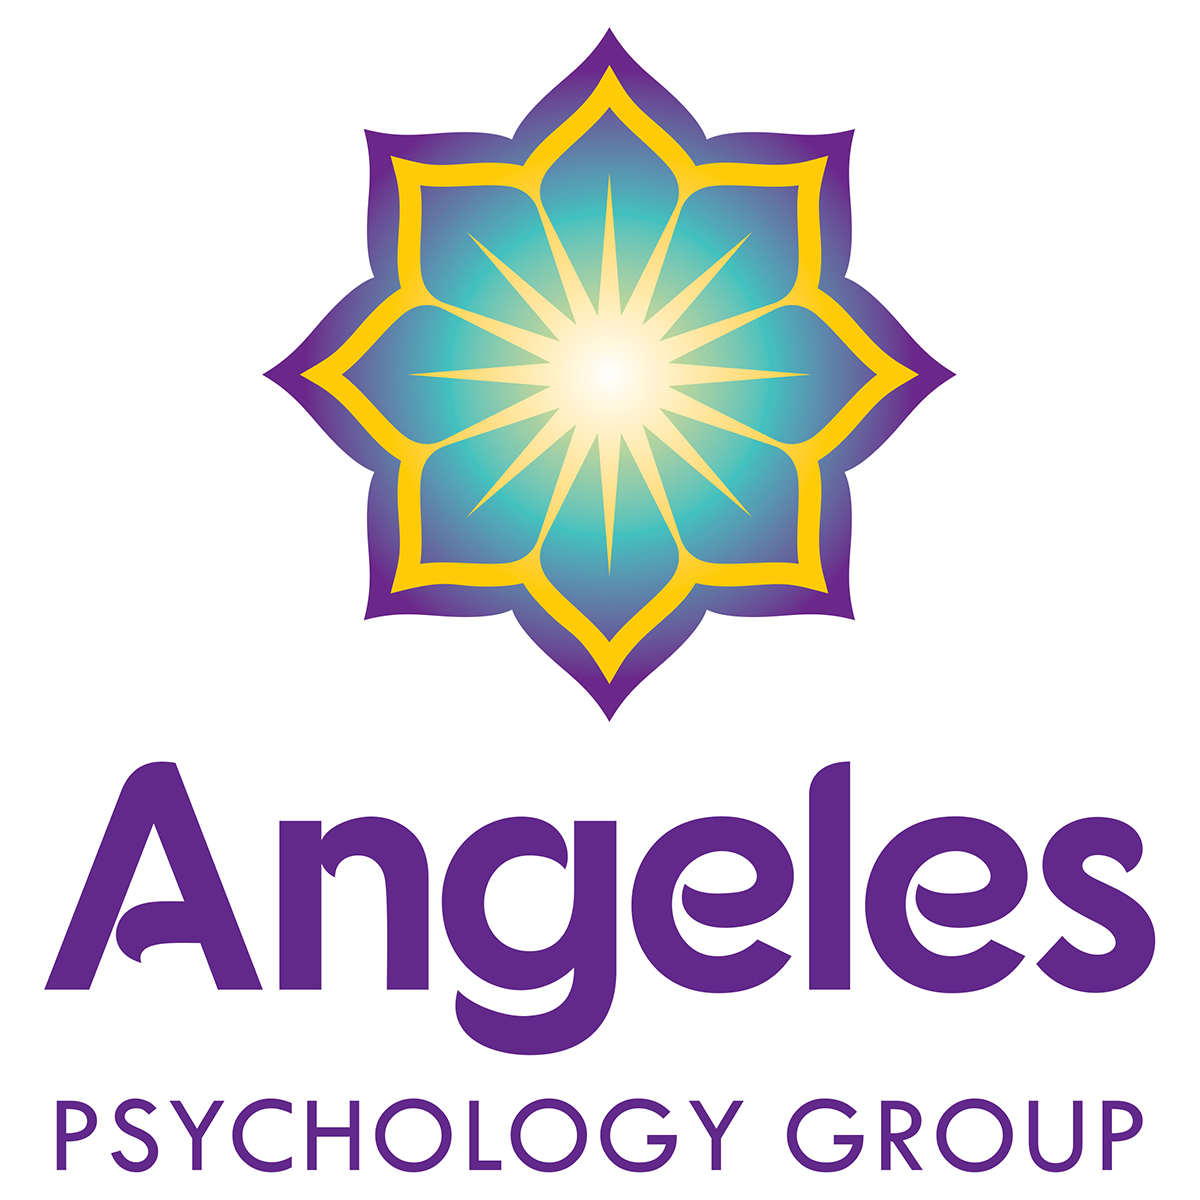 01_Angeles_logo_color_RGB_jpg.jpg